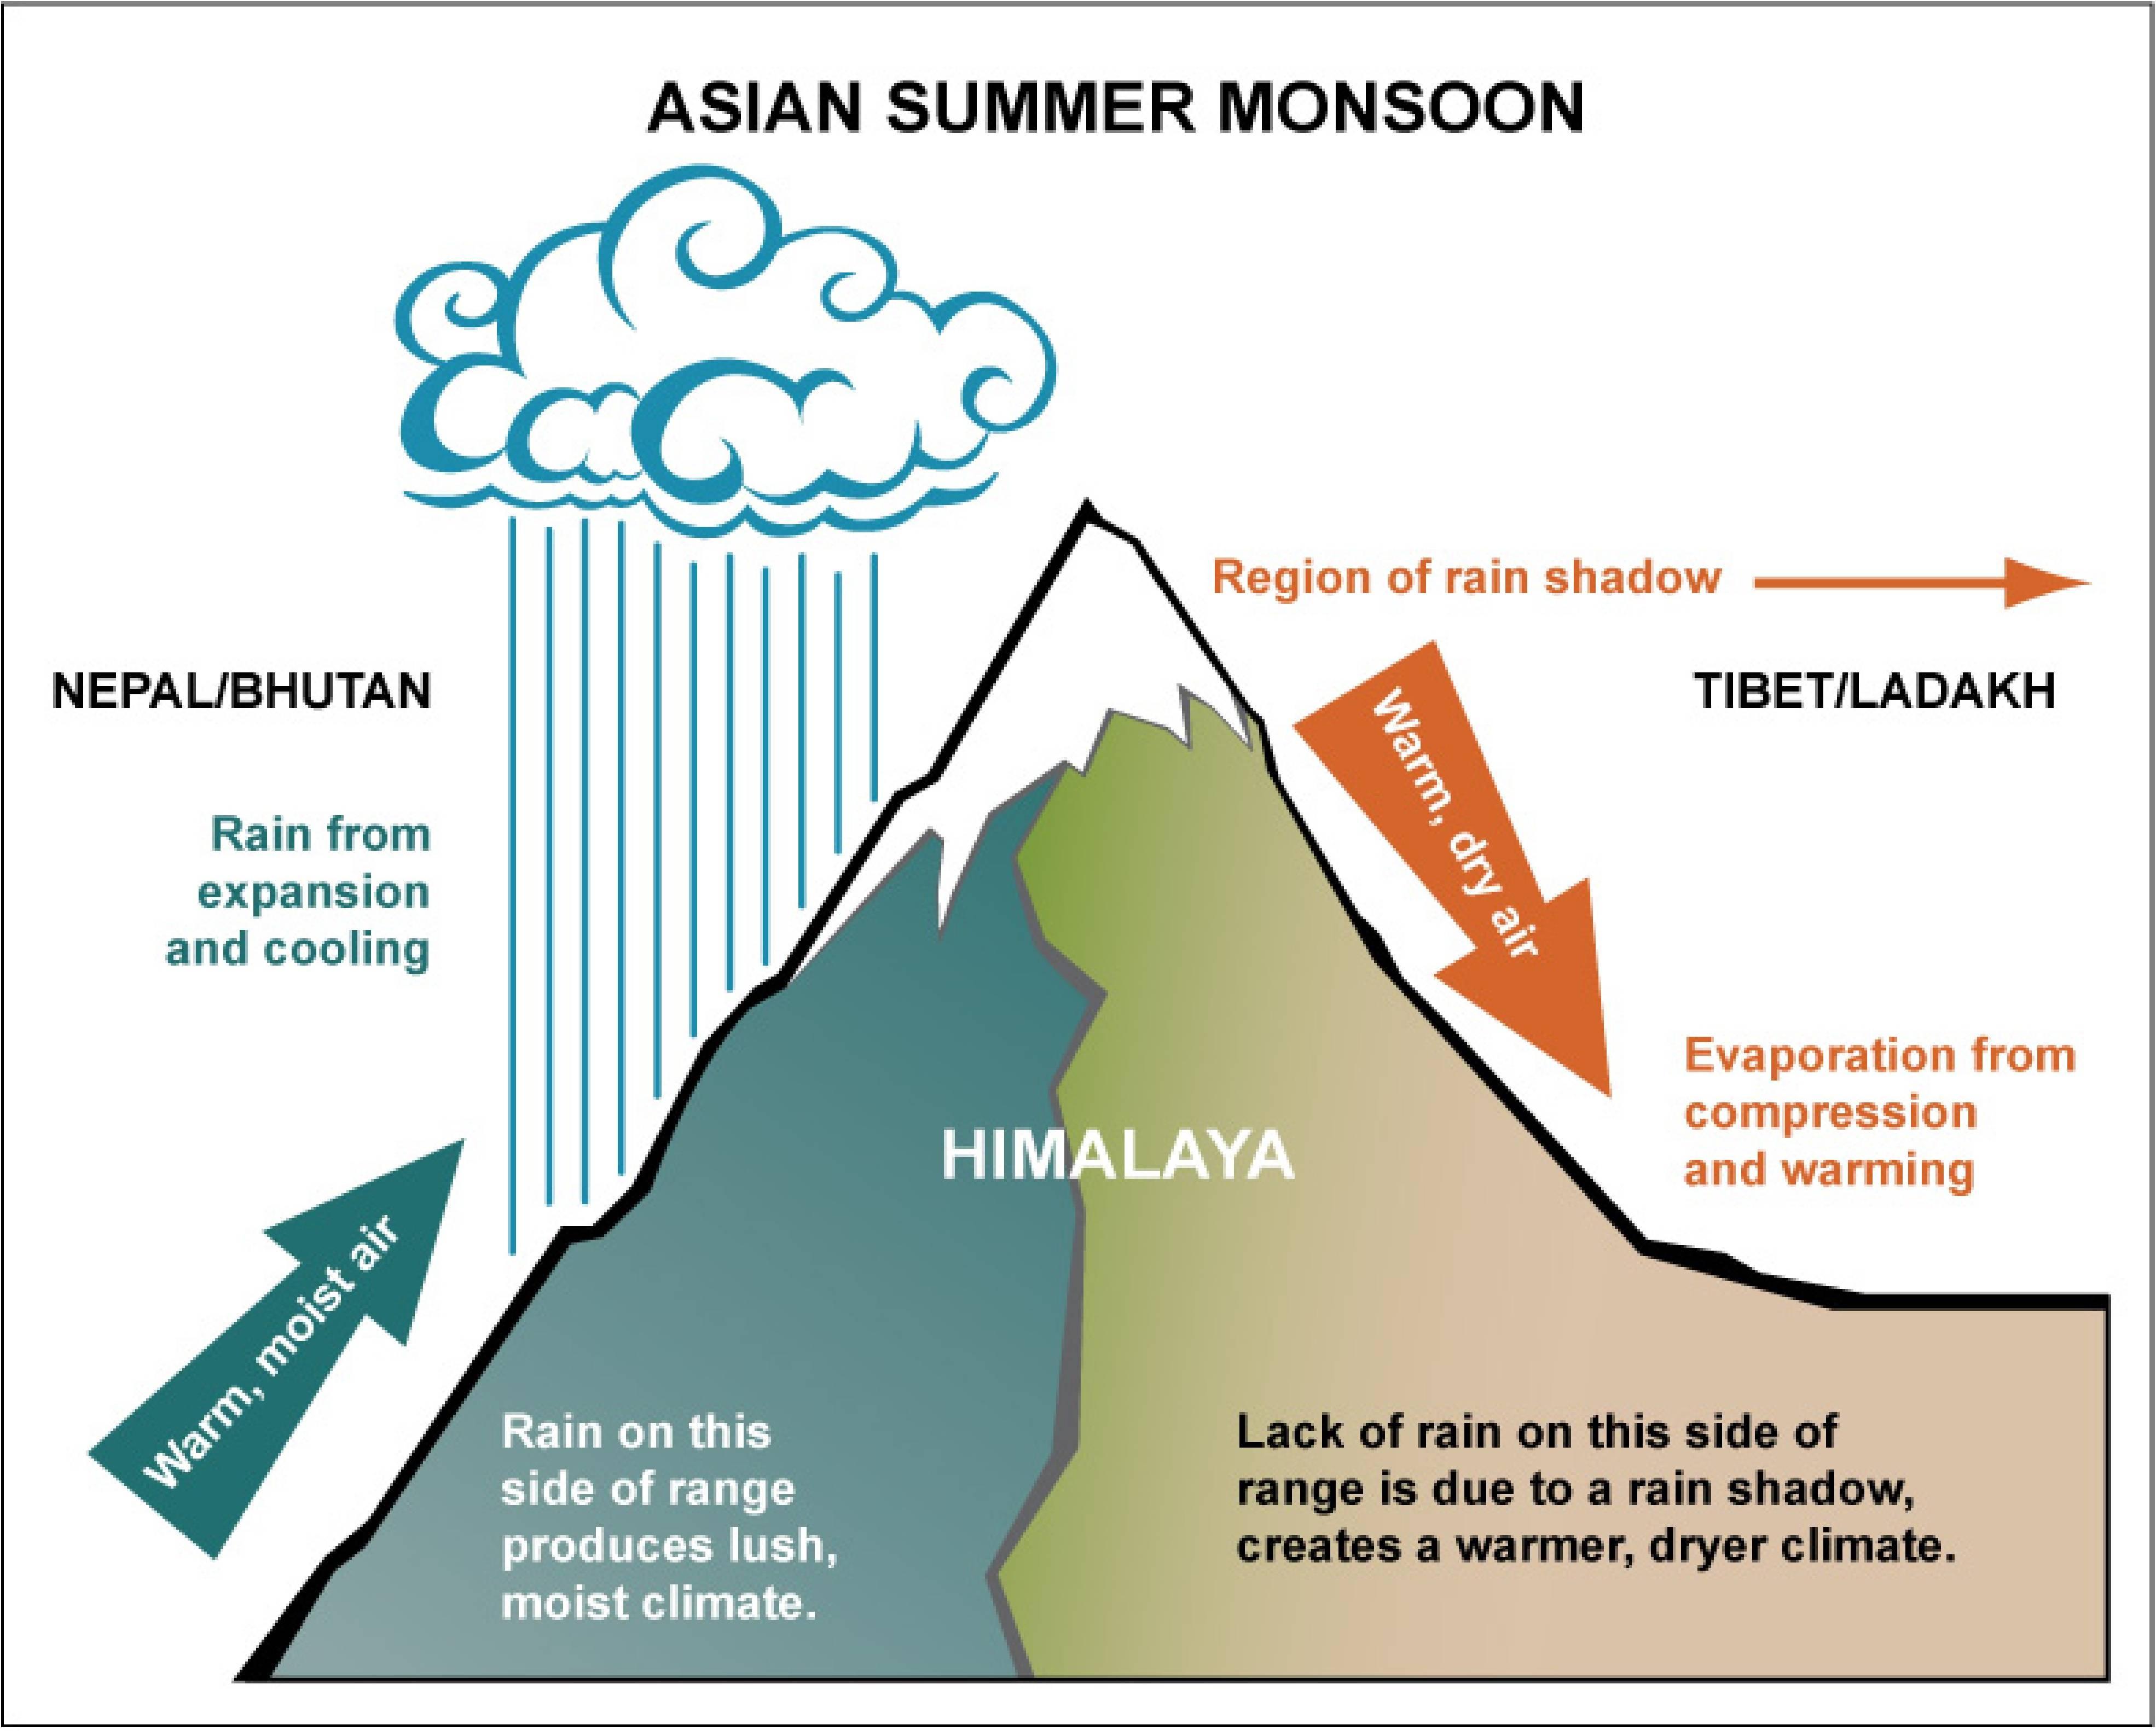 rainfall precipitation diagram uss enterprise science based lake makgadikgadi 21st century